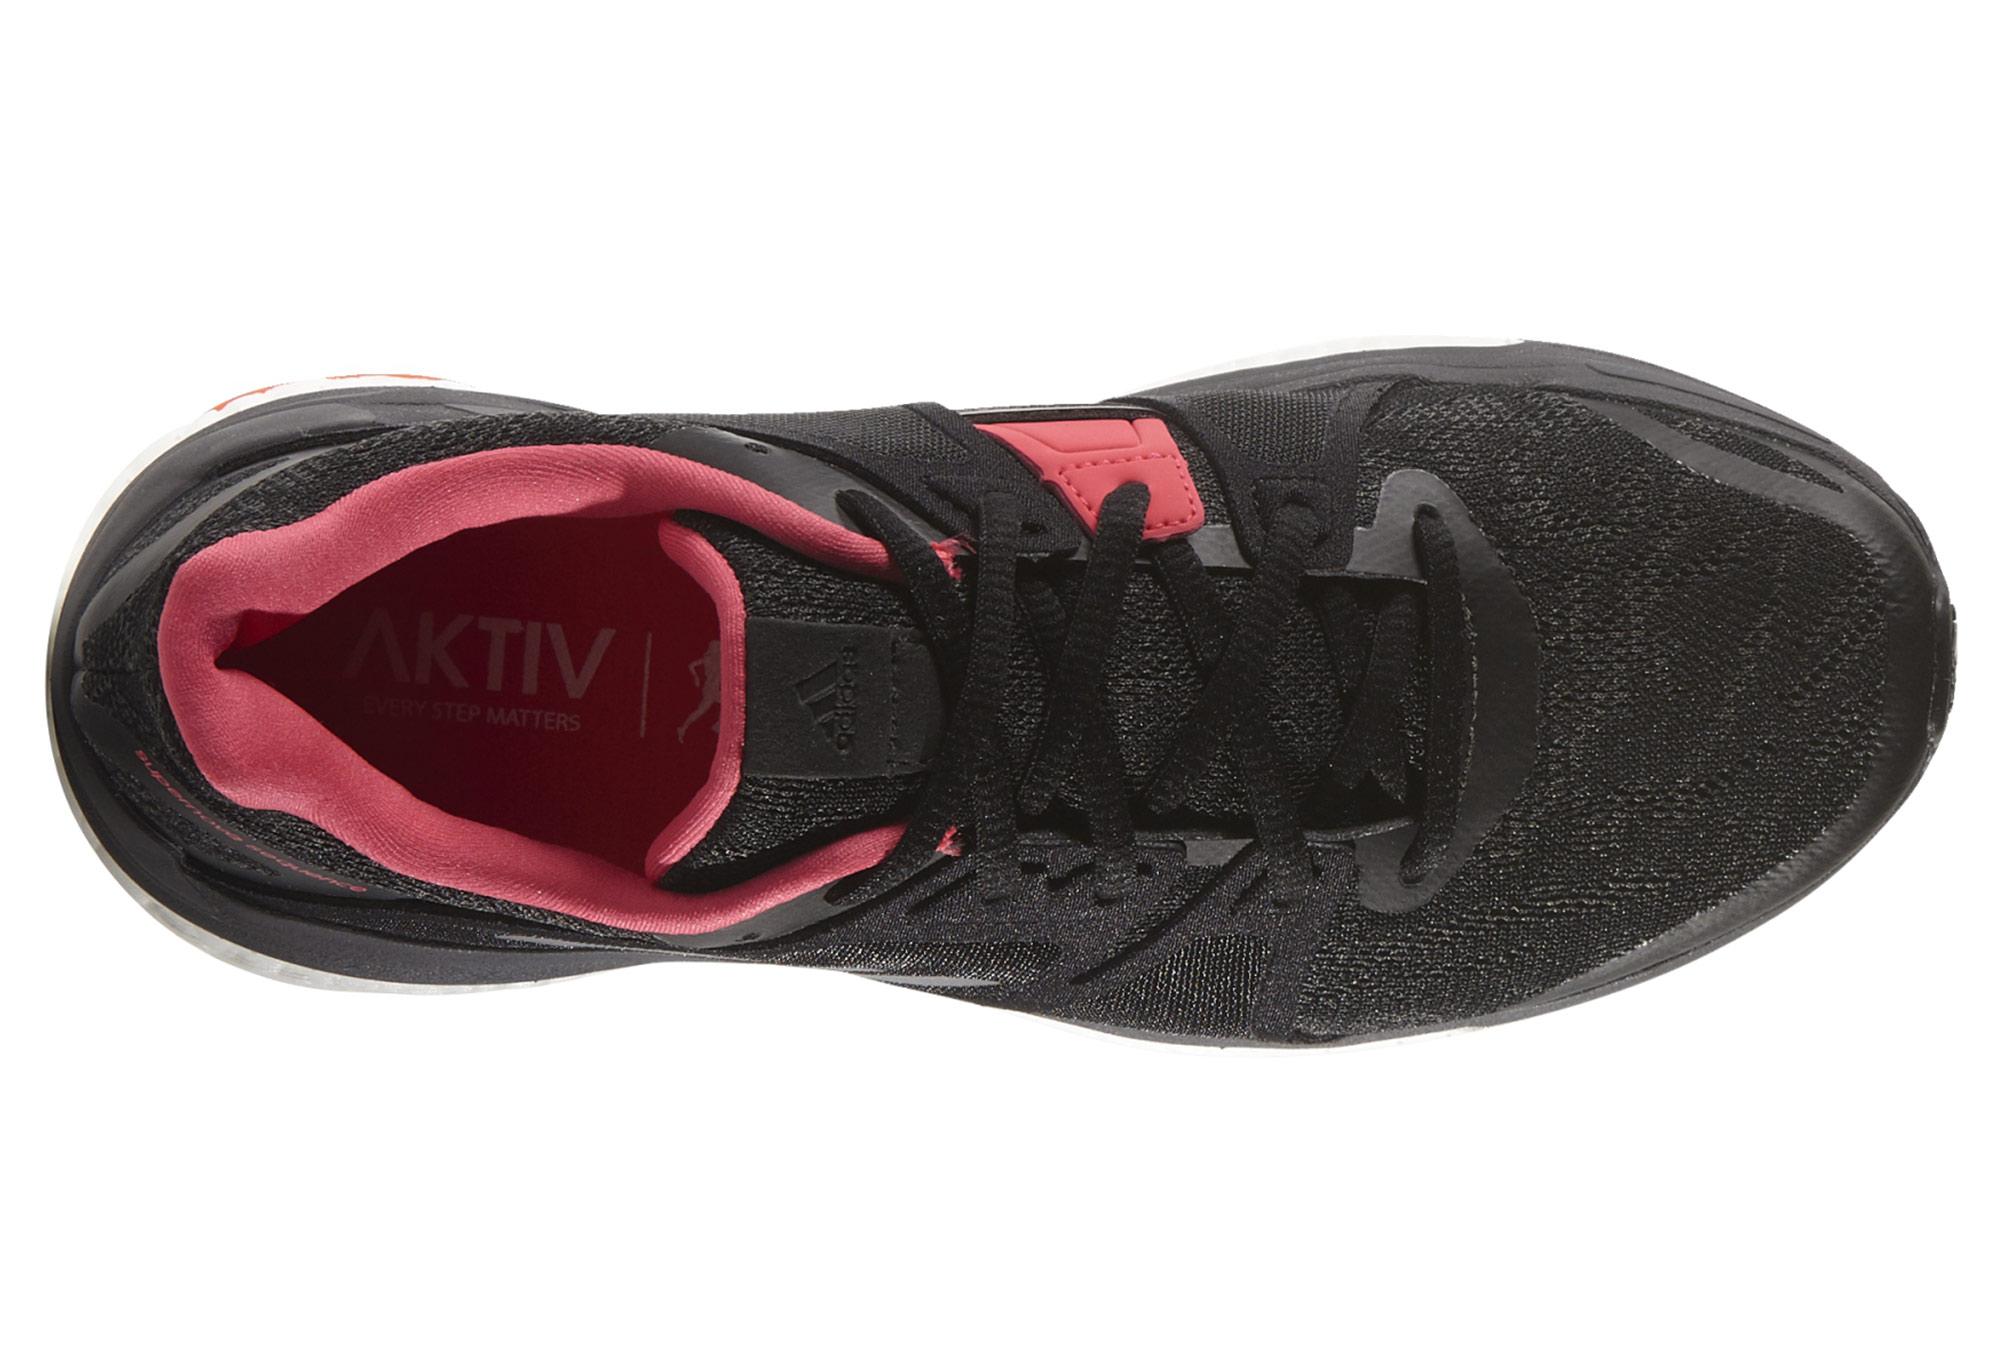 901d356e8 adidas SUPERNOVA SEQUENCE 9 Black Pink Women